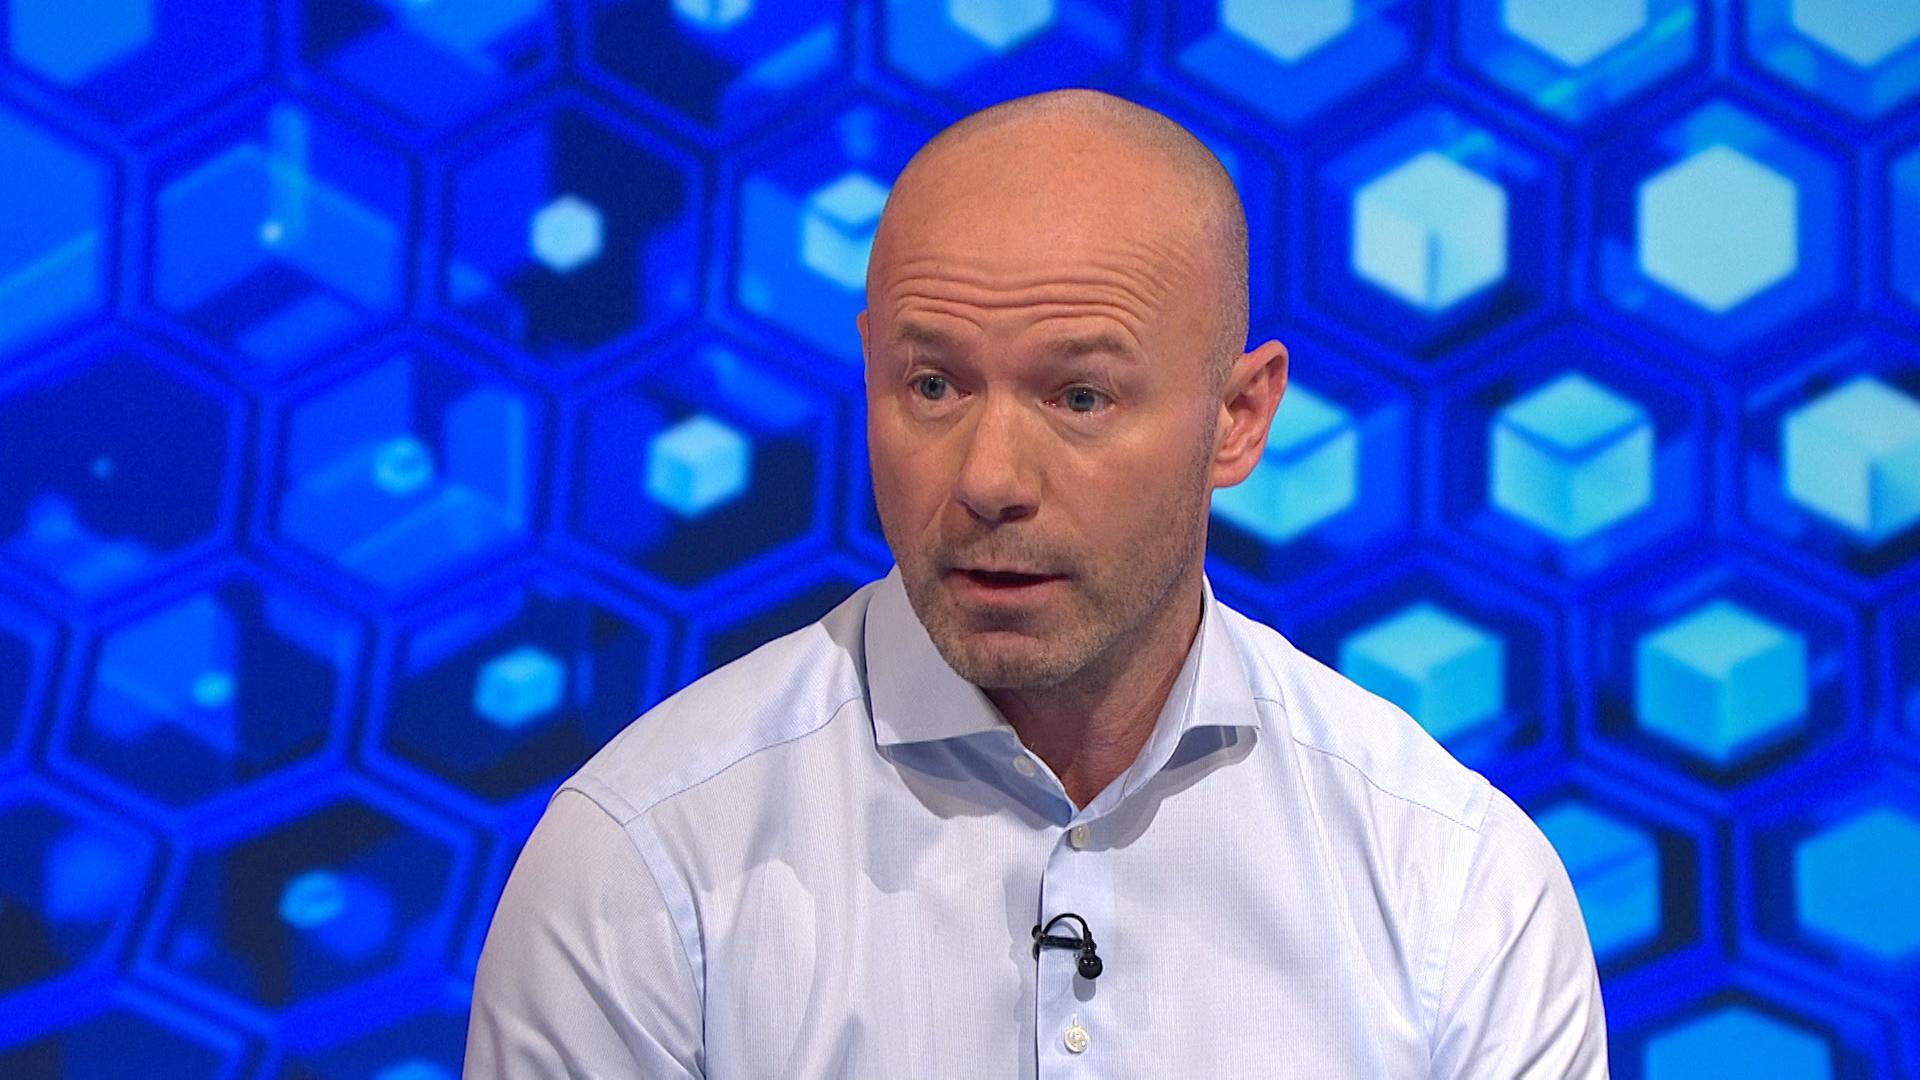 Alan Shearer says Newcastle United fans aren't get